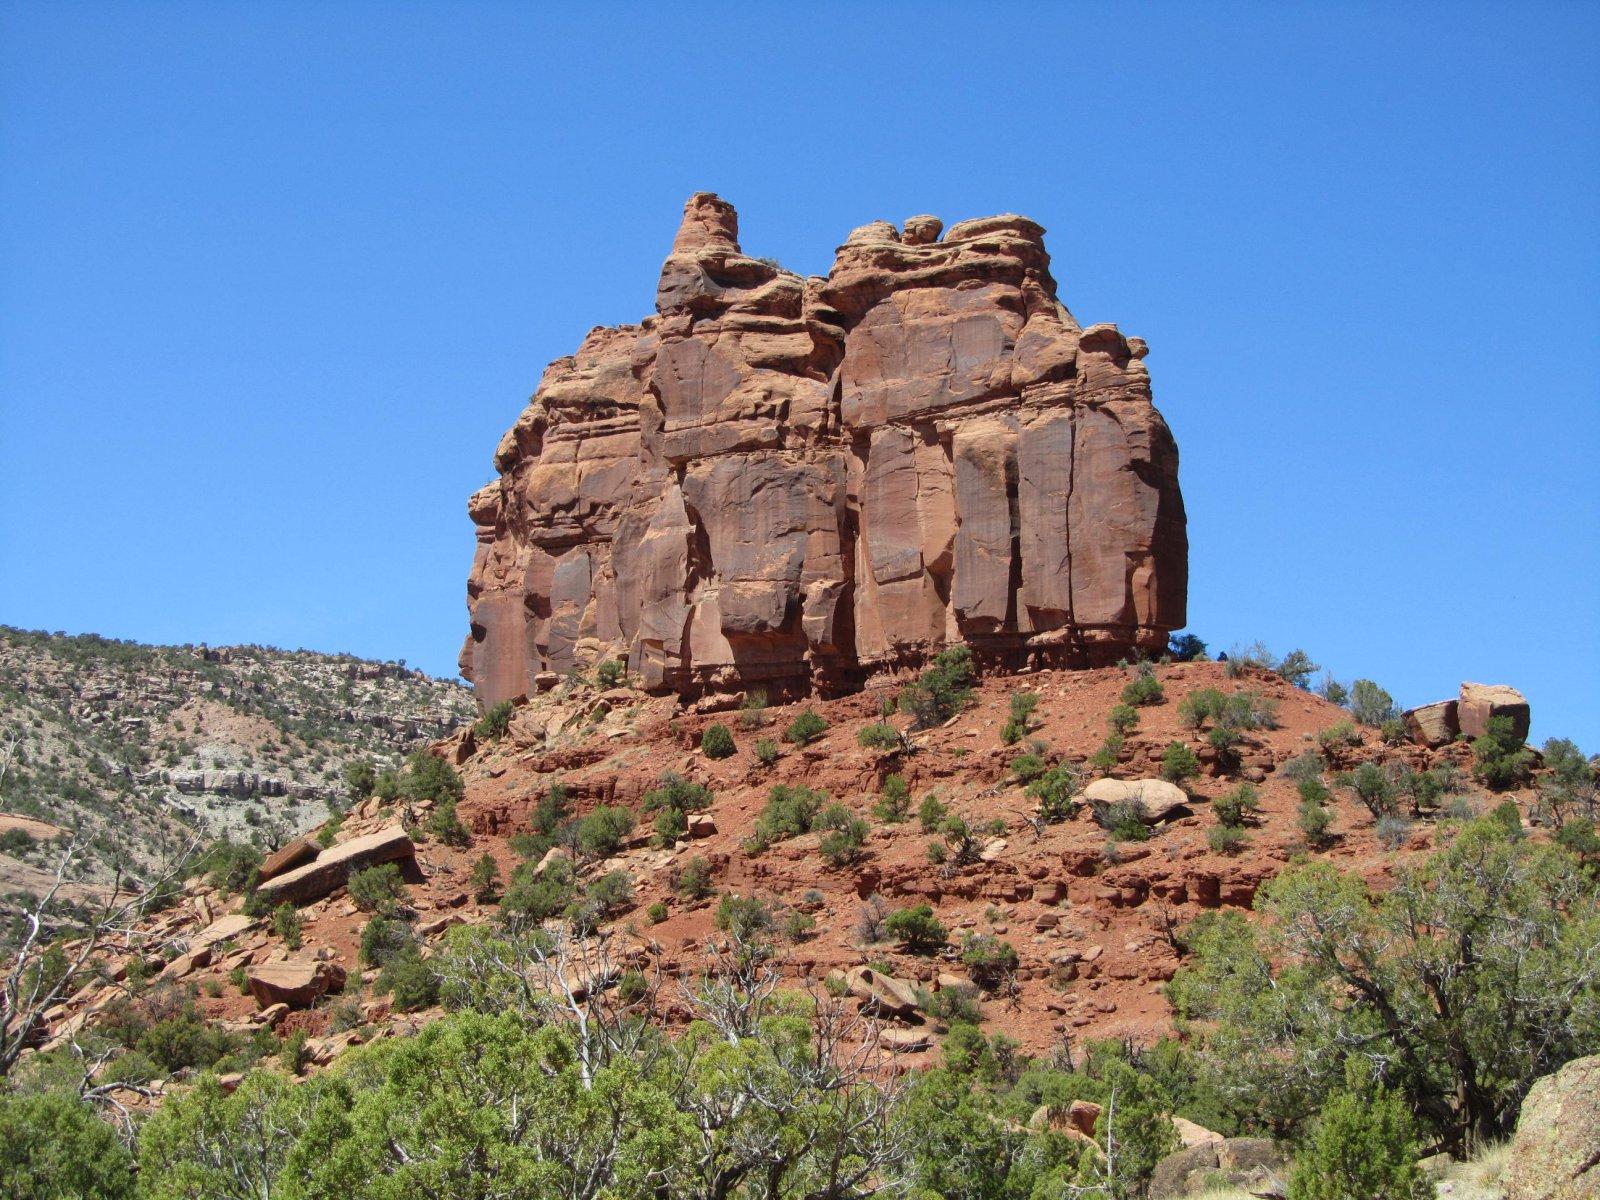 Dominguez Canyons Backpack 4.22.18 068.jpg